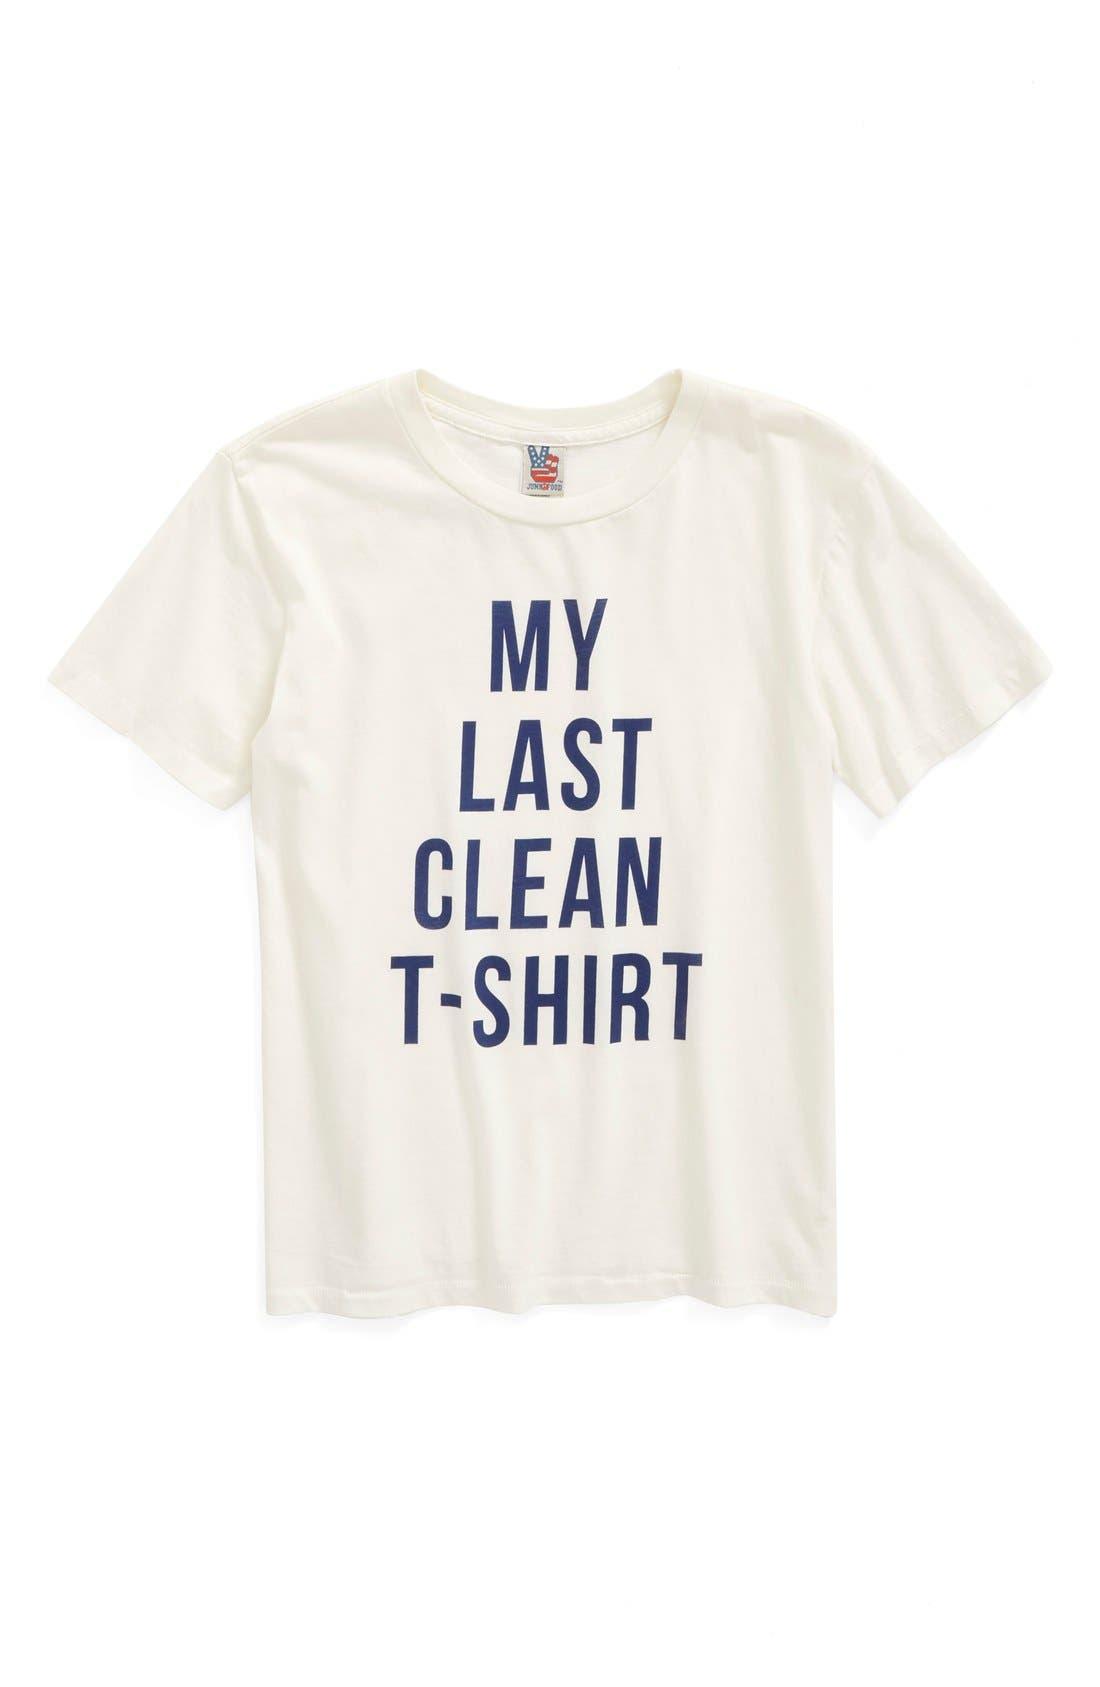 Main Image - Junk Food 'My Last Clean T-Shirt' Graphic T-Shirt (Big Boys)